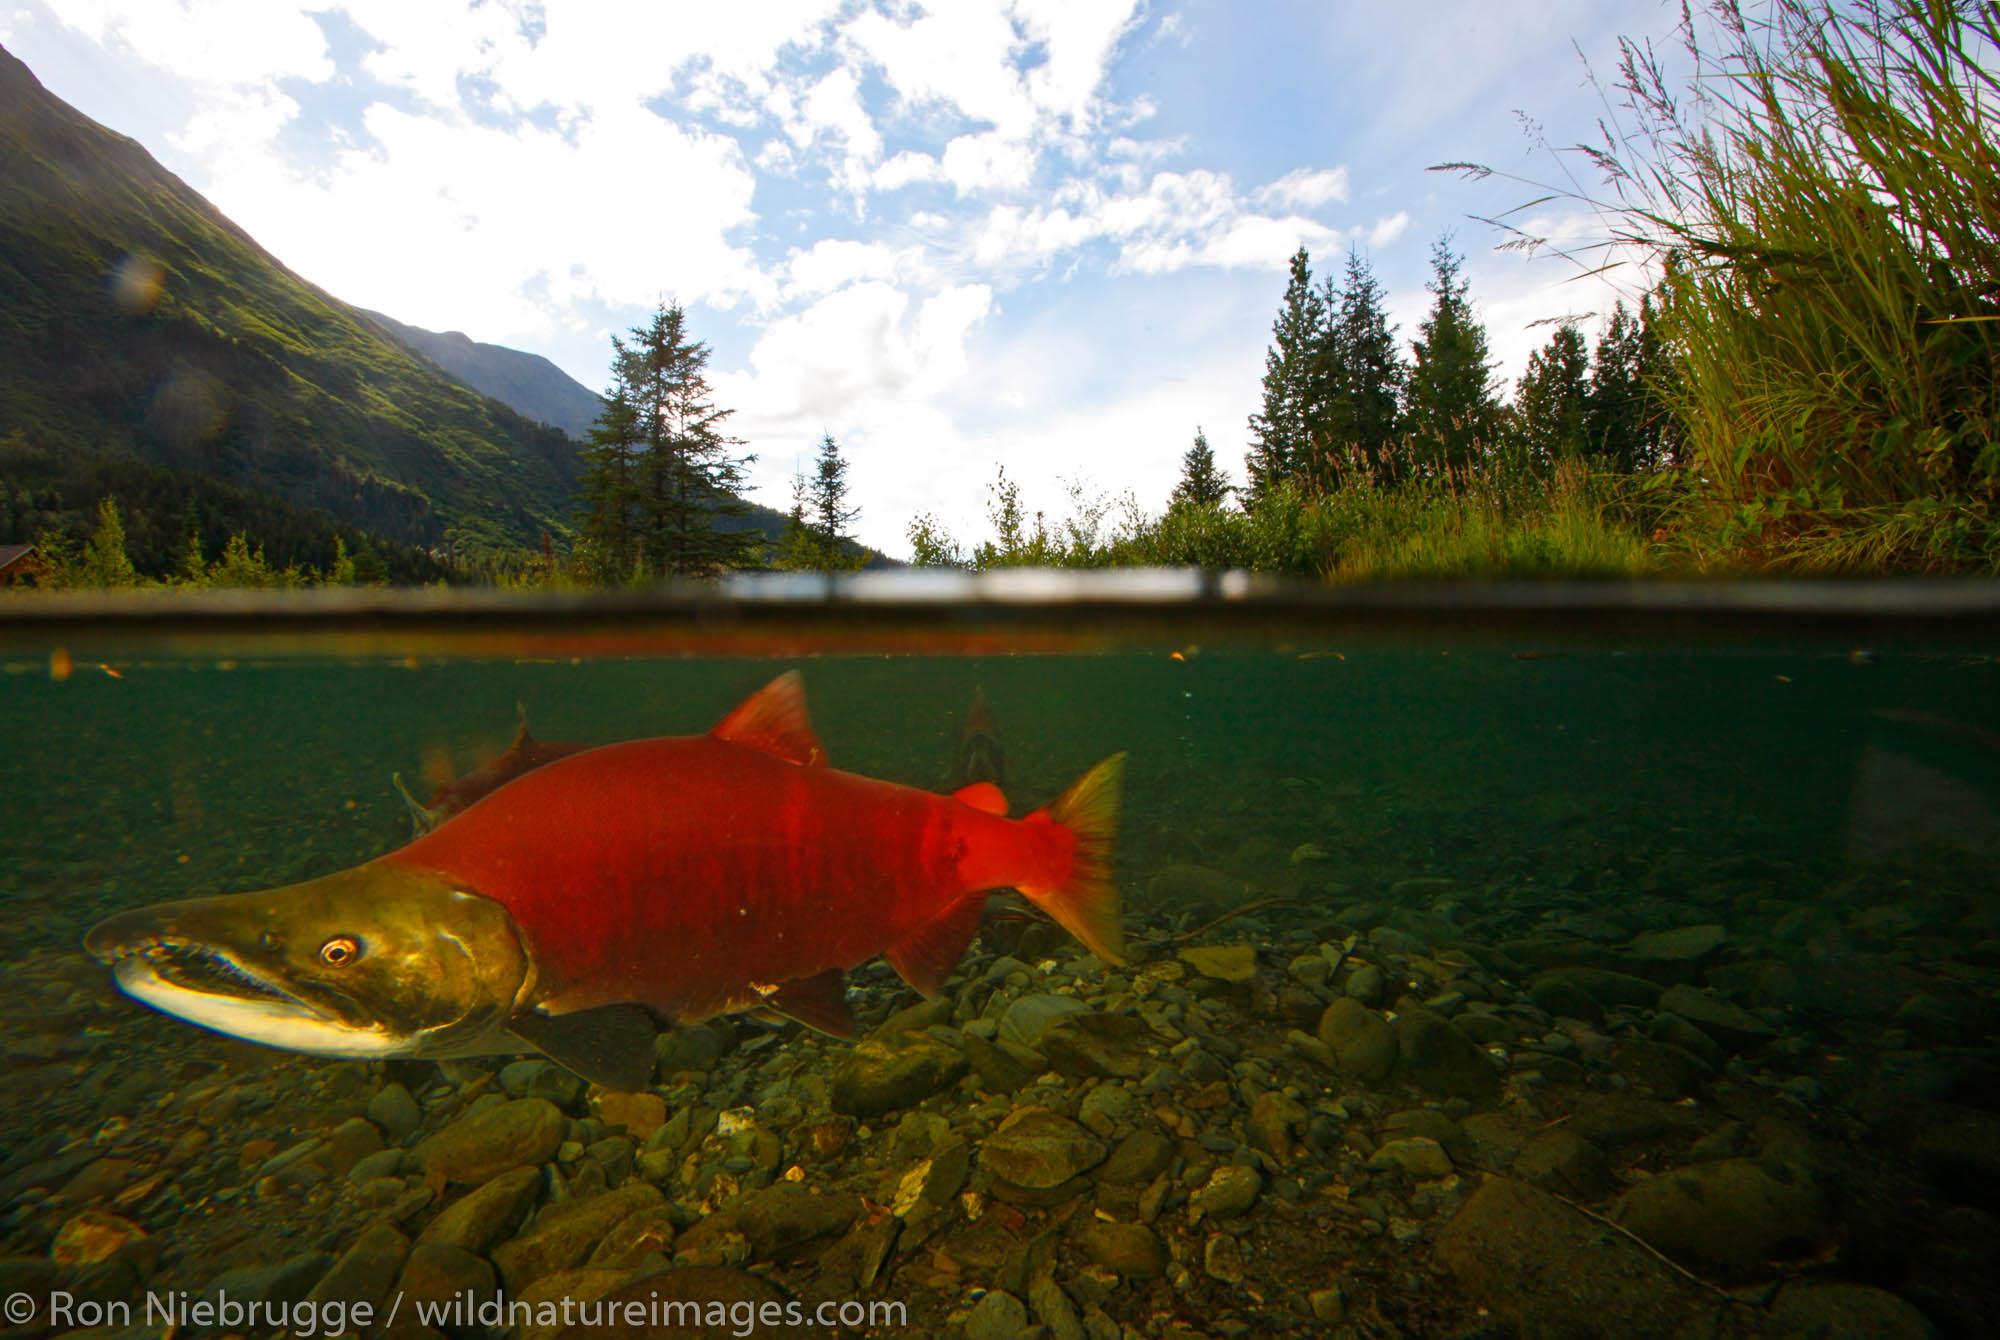 Spawning Red Salmon, Tern Lake, Kenai Peninsula, Chugach National Forest, Alaska.